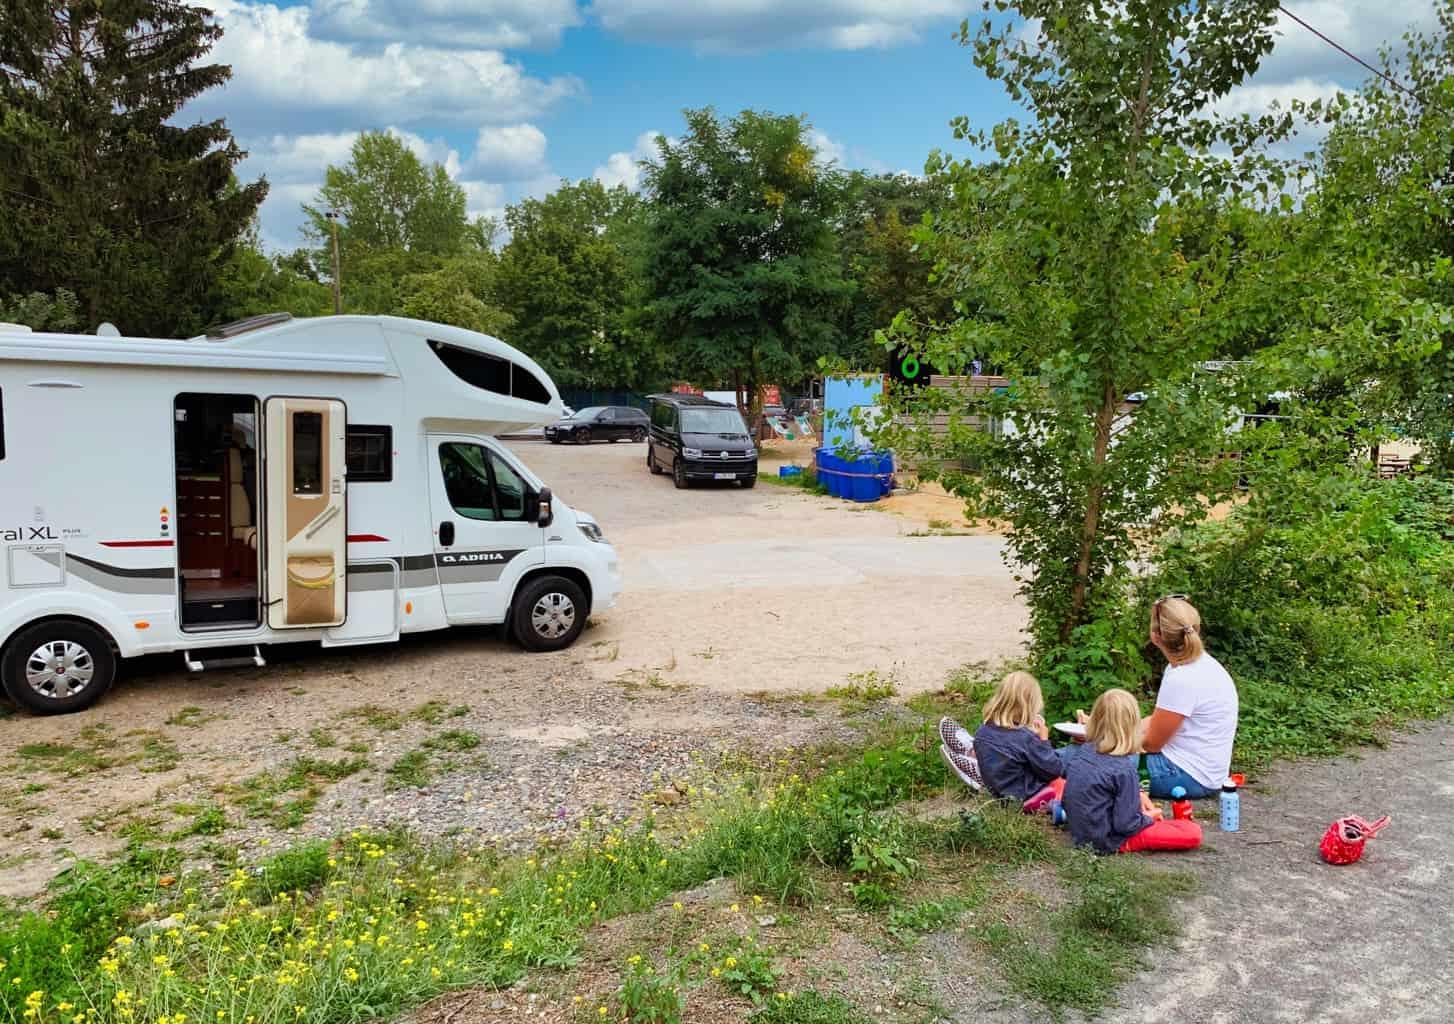 Leipzig-Stadtstrand-Beach-Wohnmobil-Parkplatz-Snack